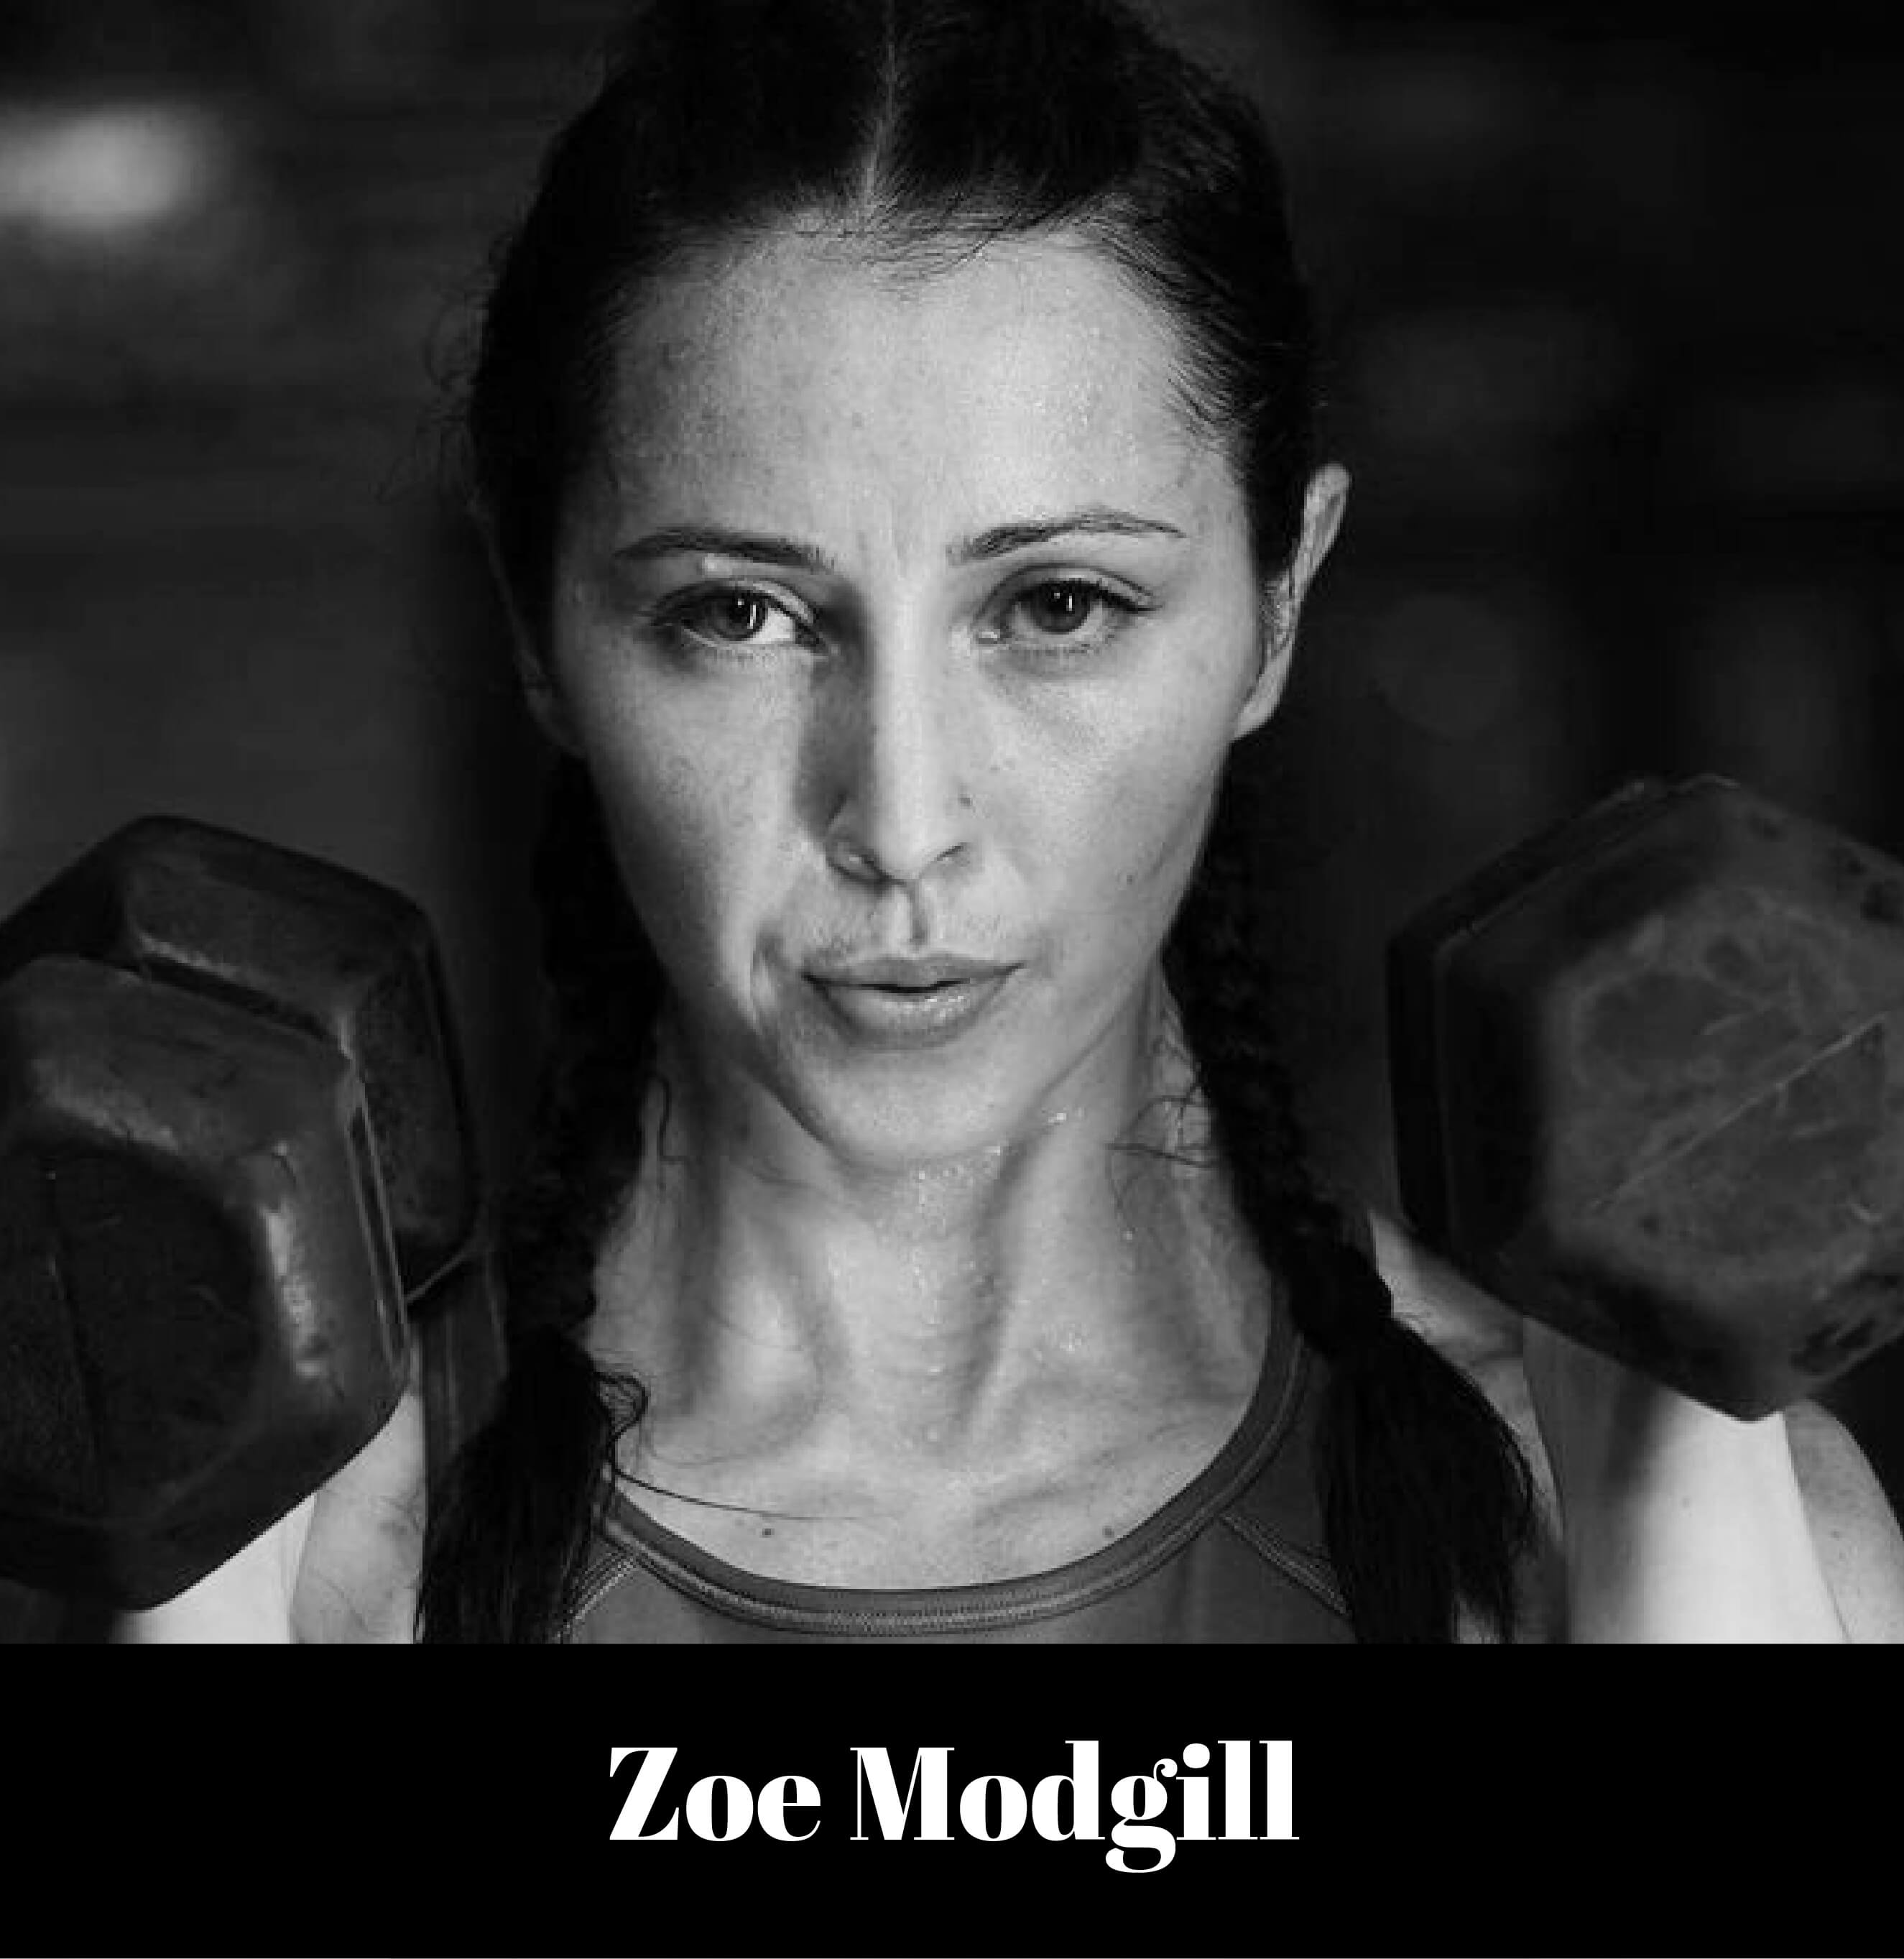 Zoe-Modgill_1.jpg